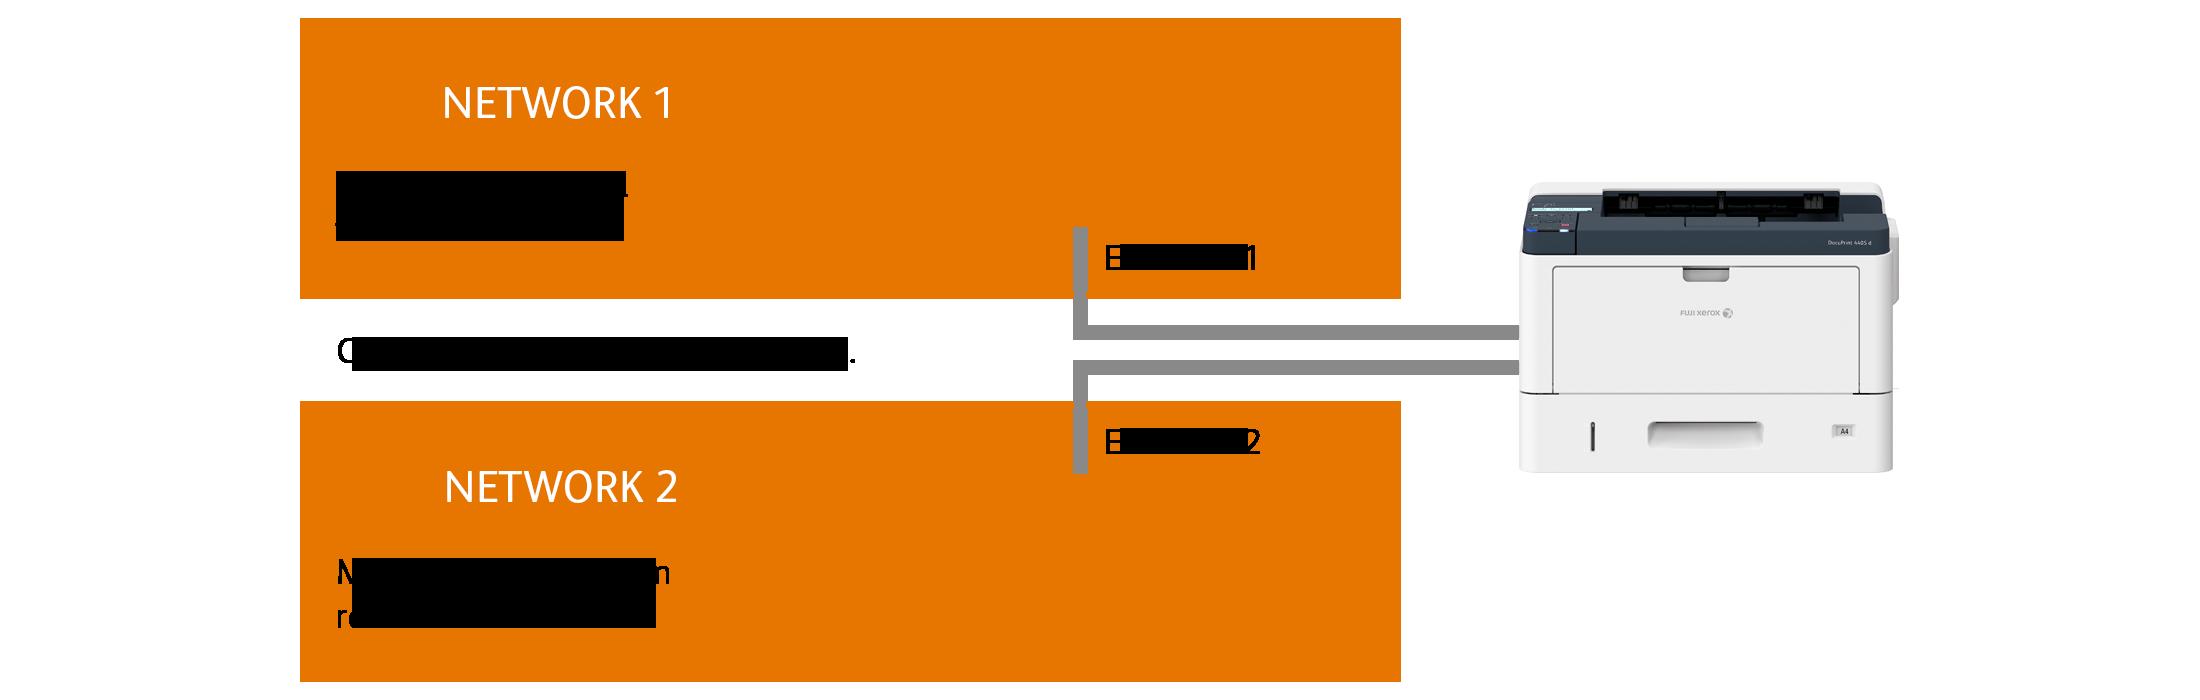 Dual network capability